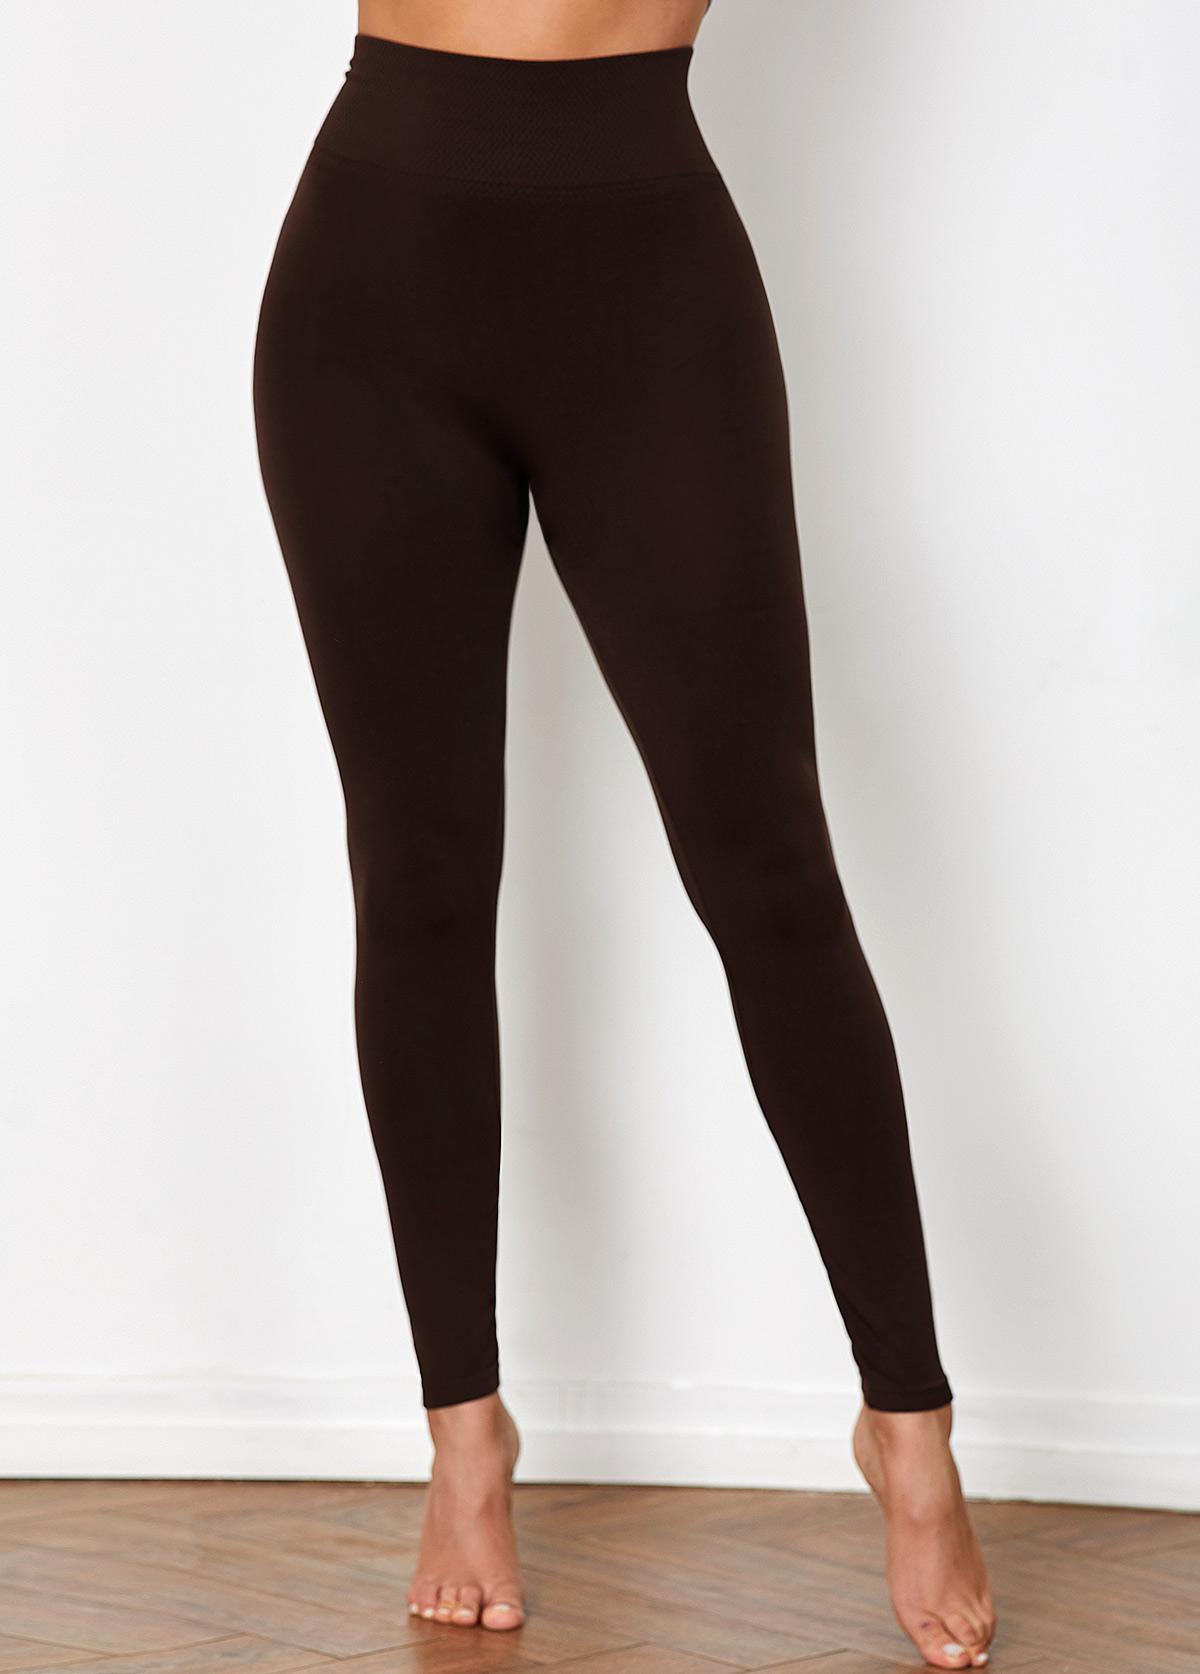 High Waist Super Elastic Brown Legging